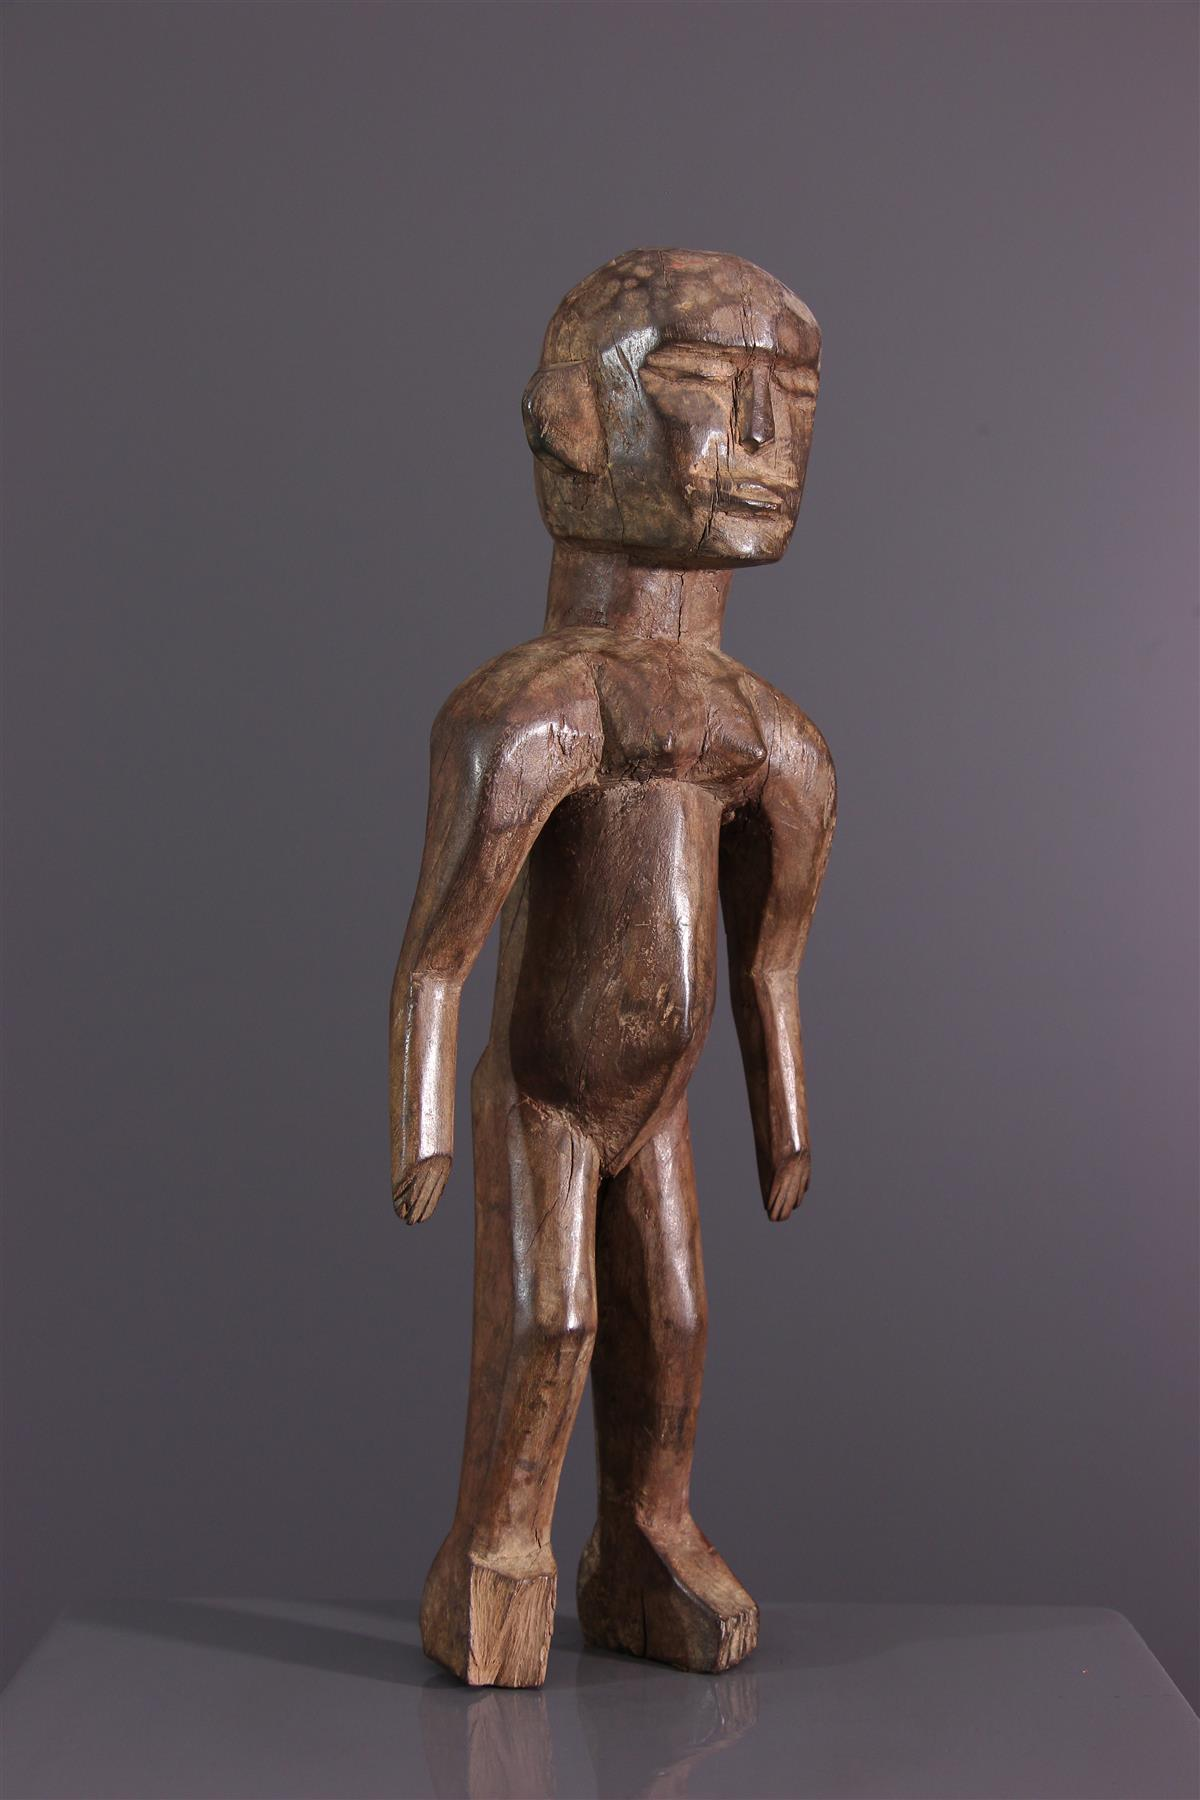 Gurunsi figurines - African art